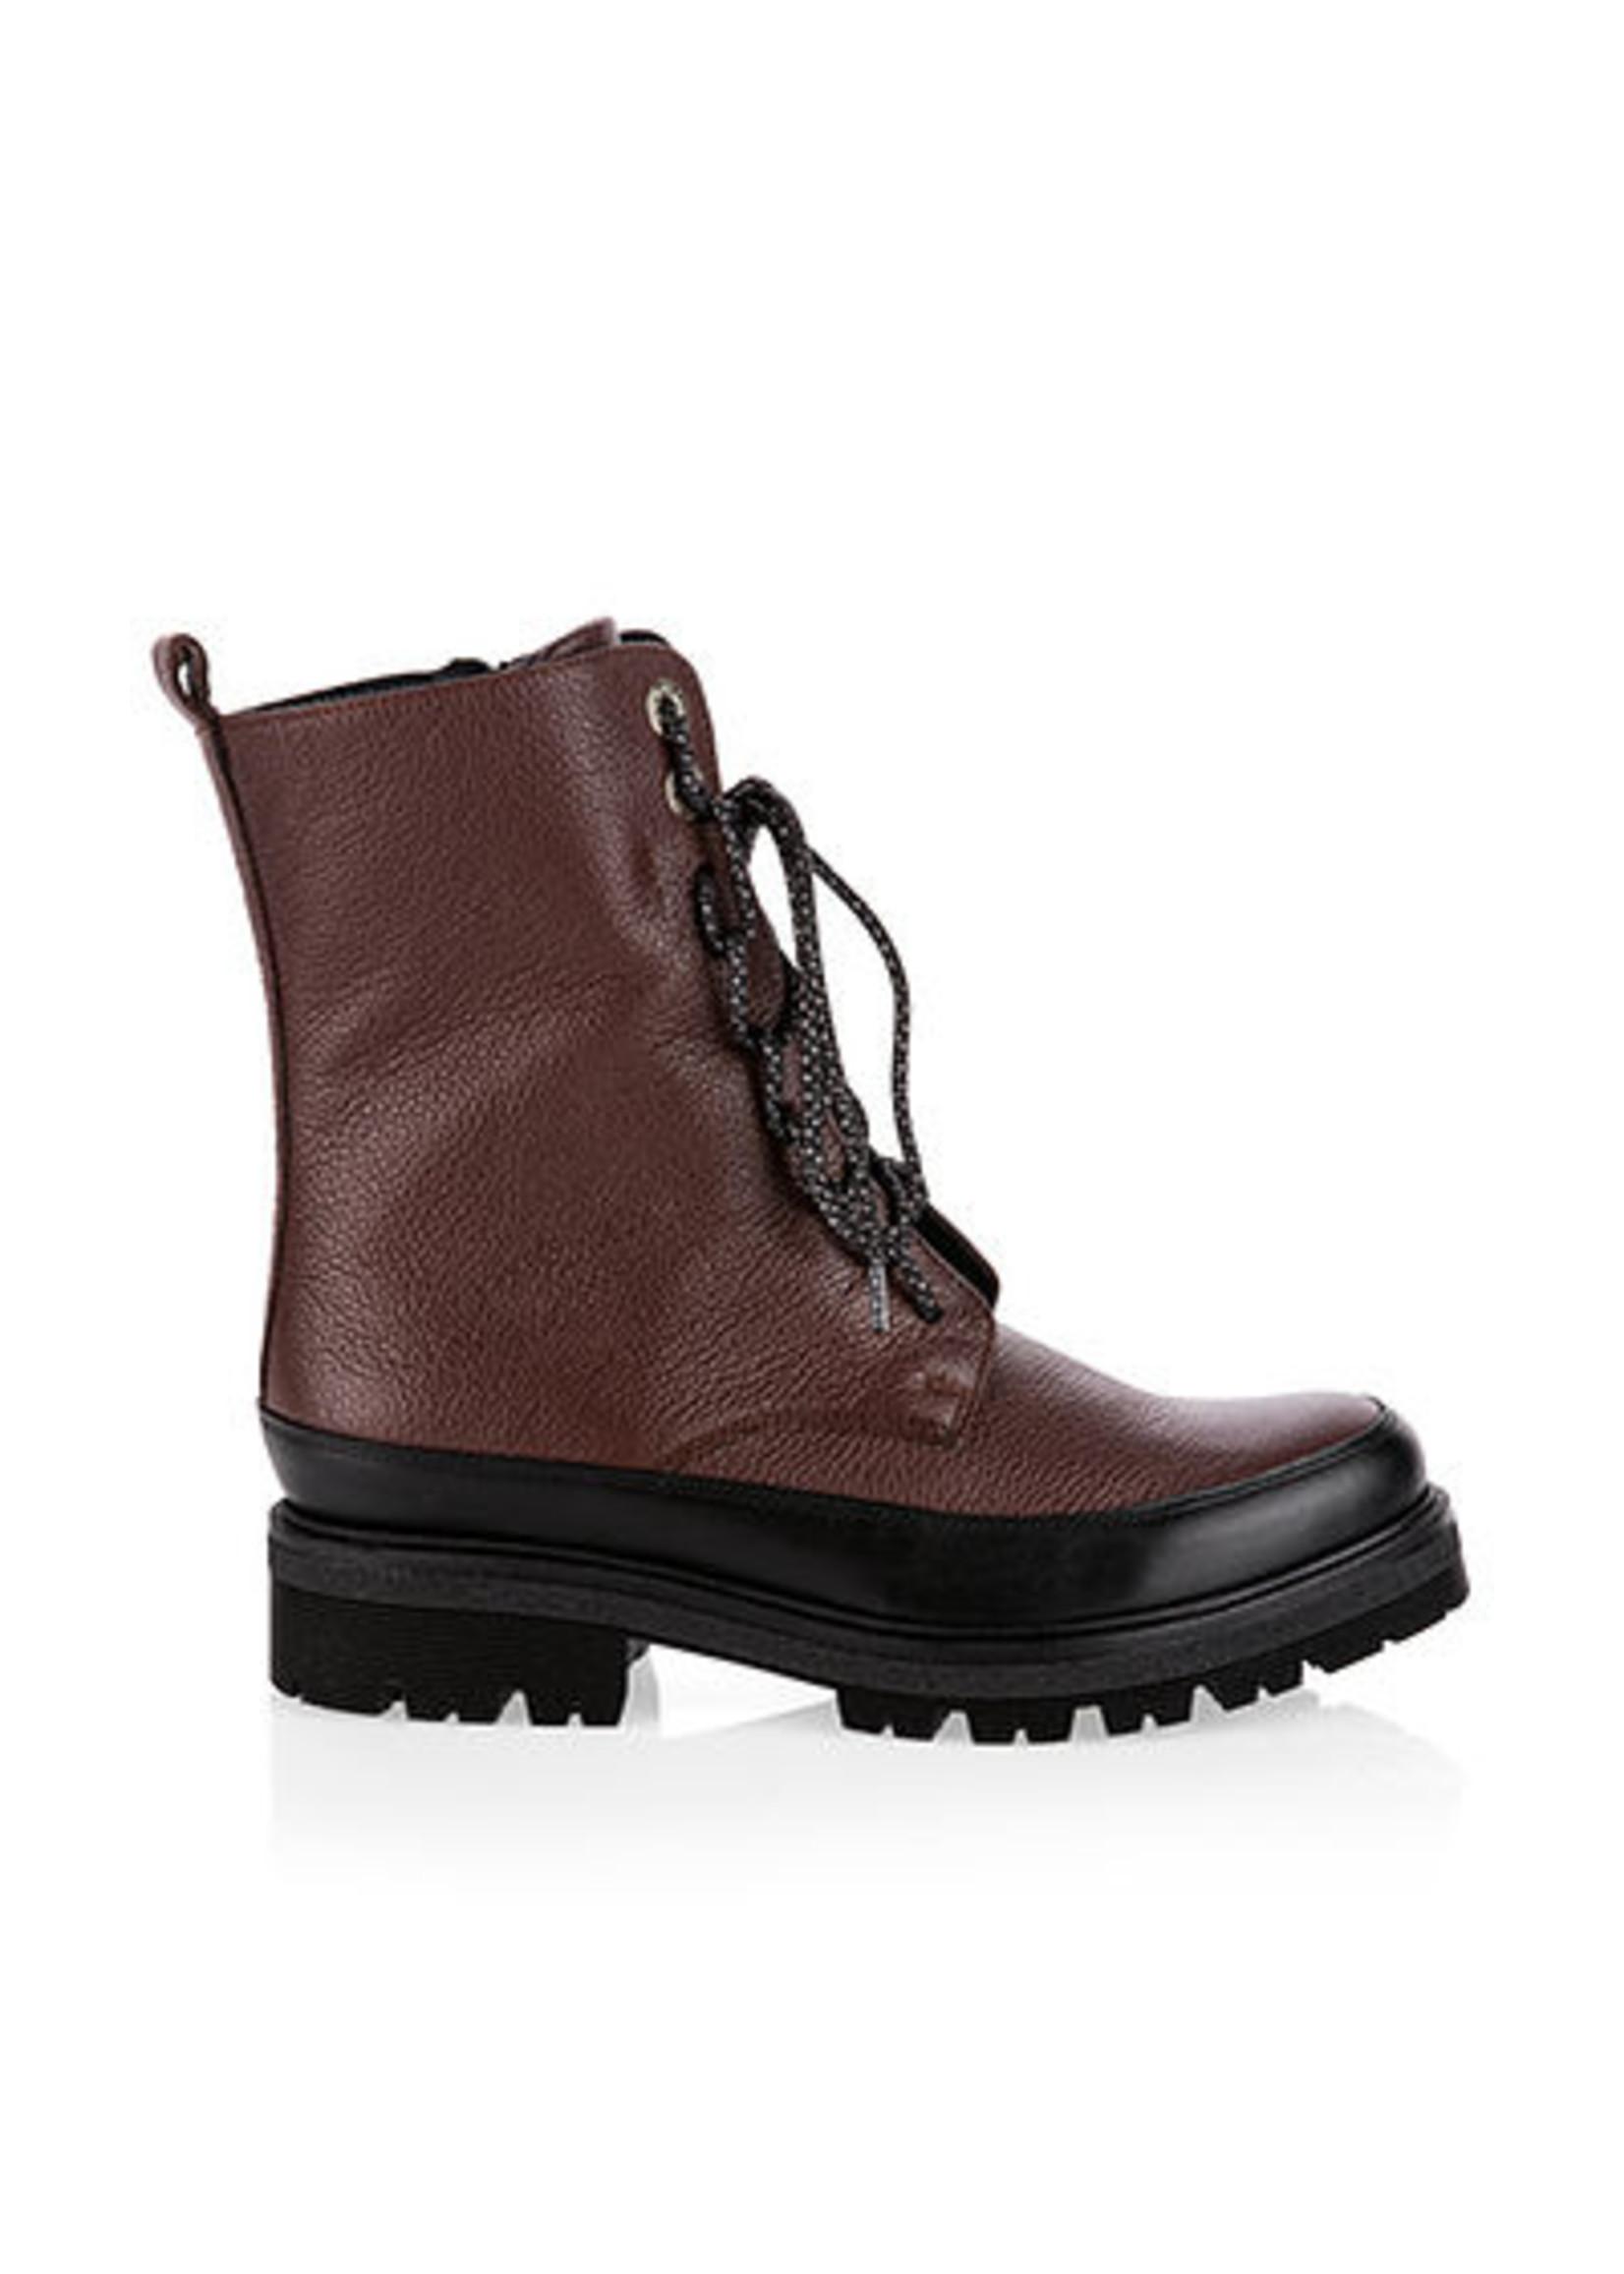 Marccain Bags & Shoes Enkel Laars RB SB.10 L10 cocoa